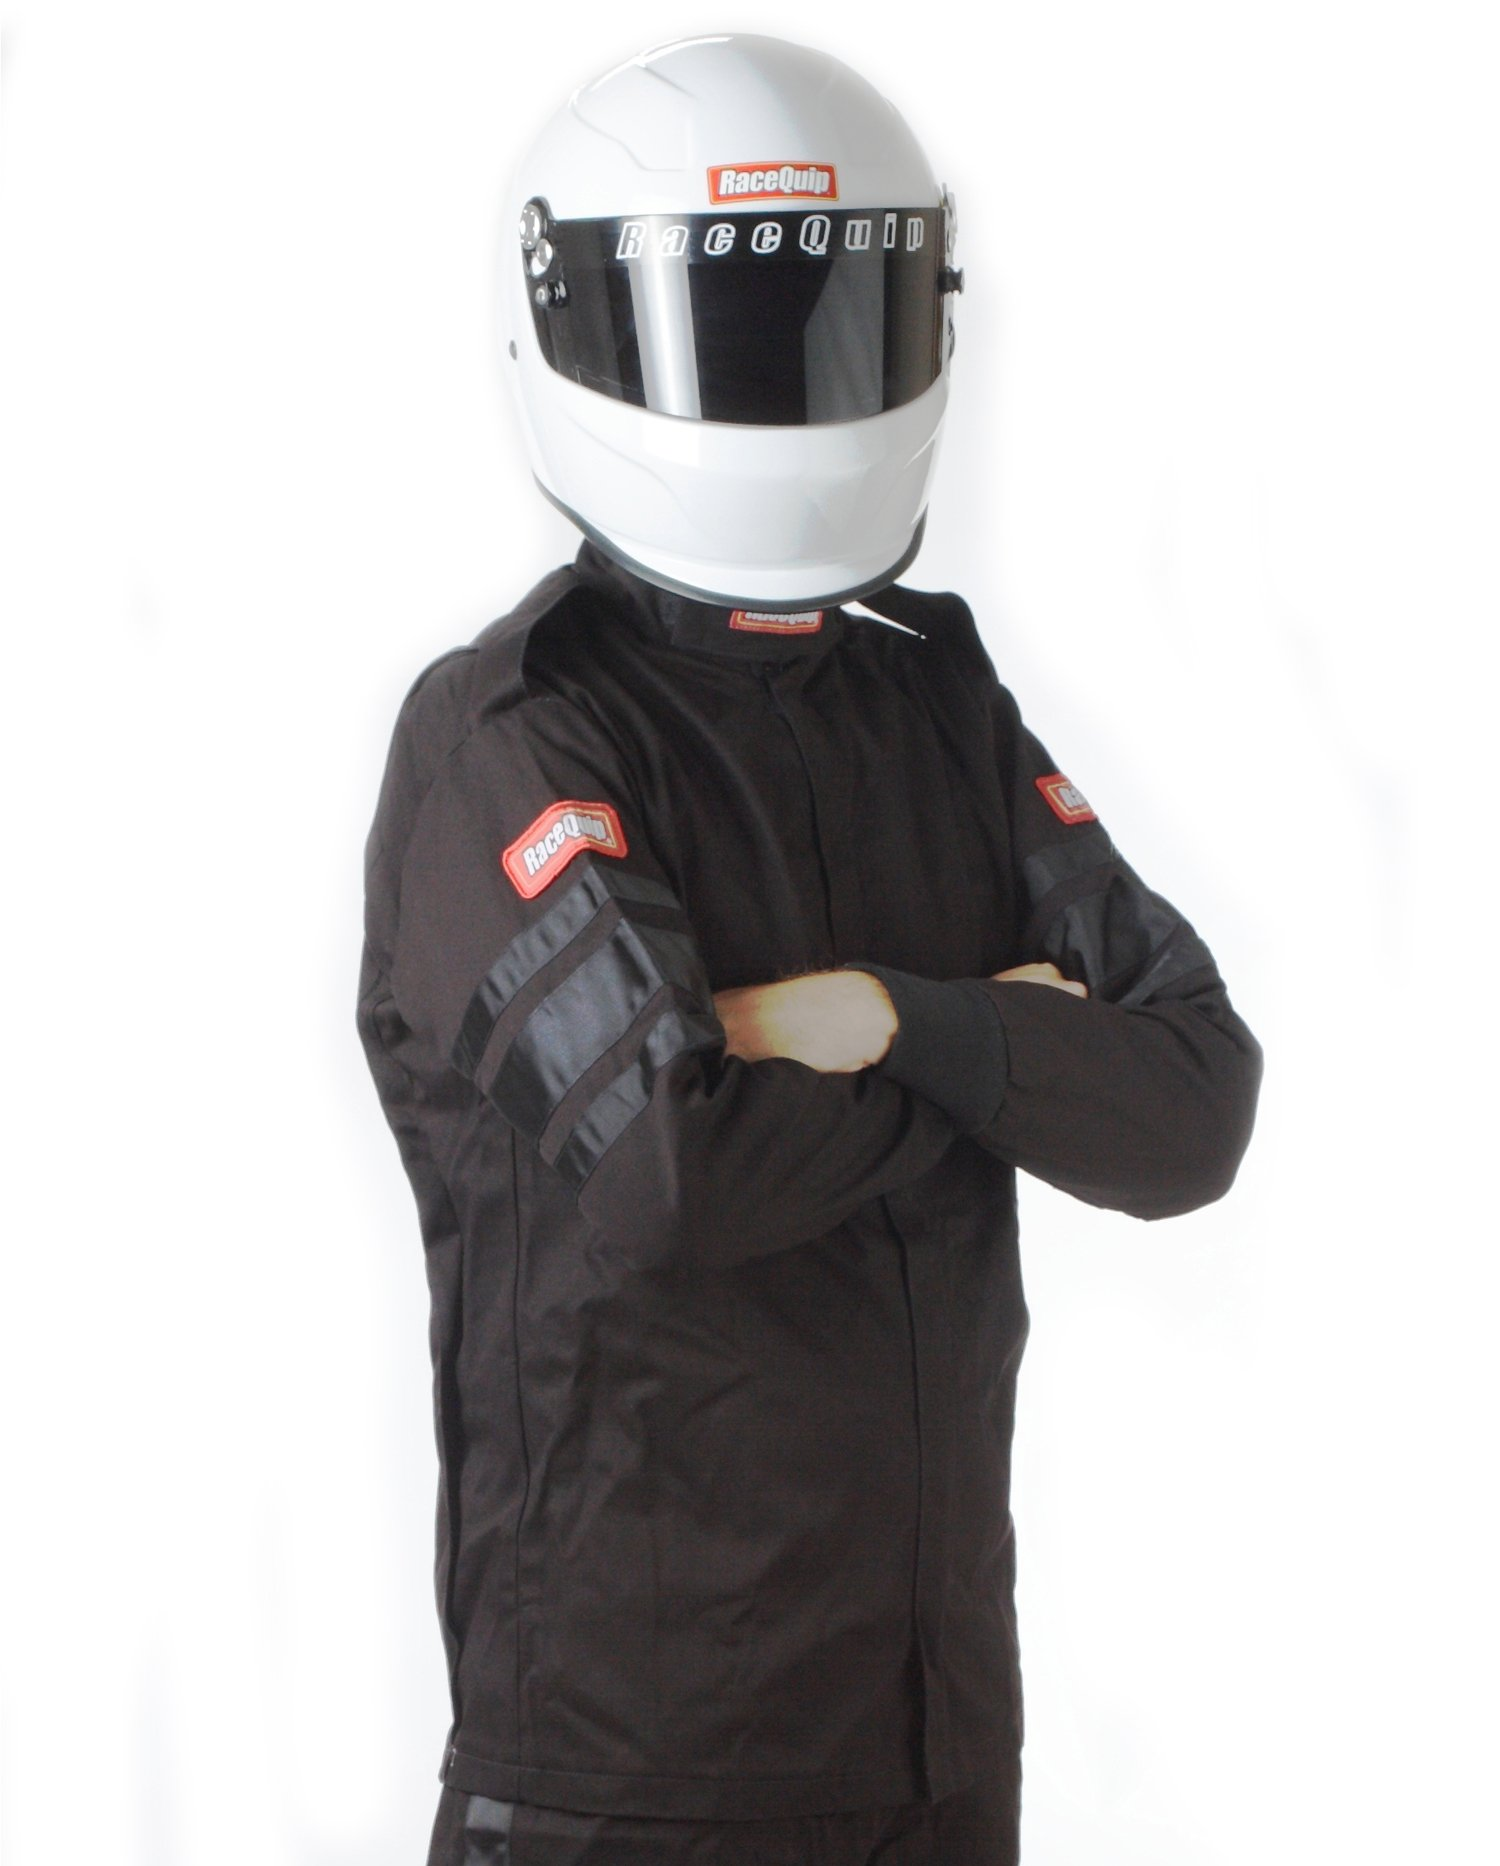 RaceQuip 111008 111 Series XXX-Large Black SFI 3.2A/1 Single Layer Driving Jacket